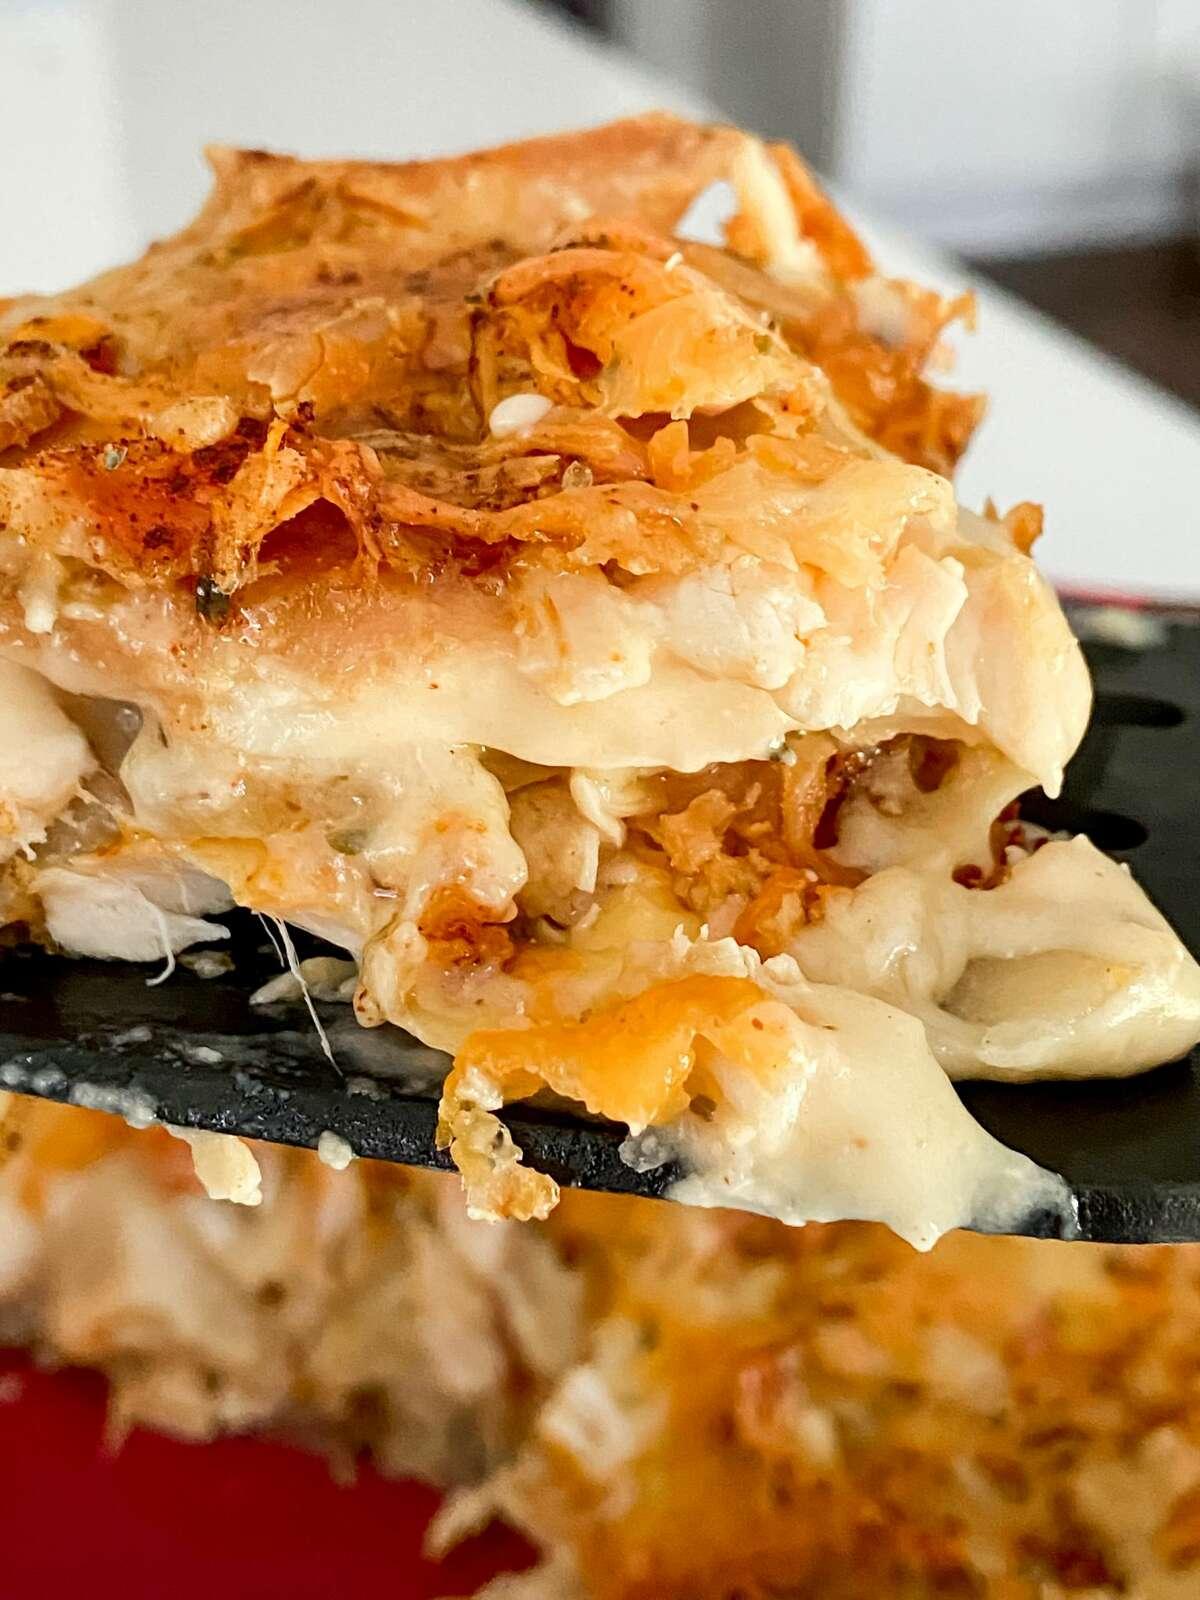 Rotisserie chicken meets scalloped potatoes